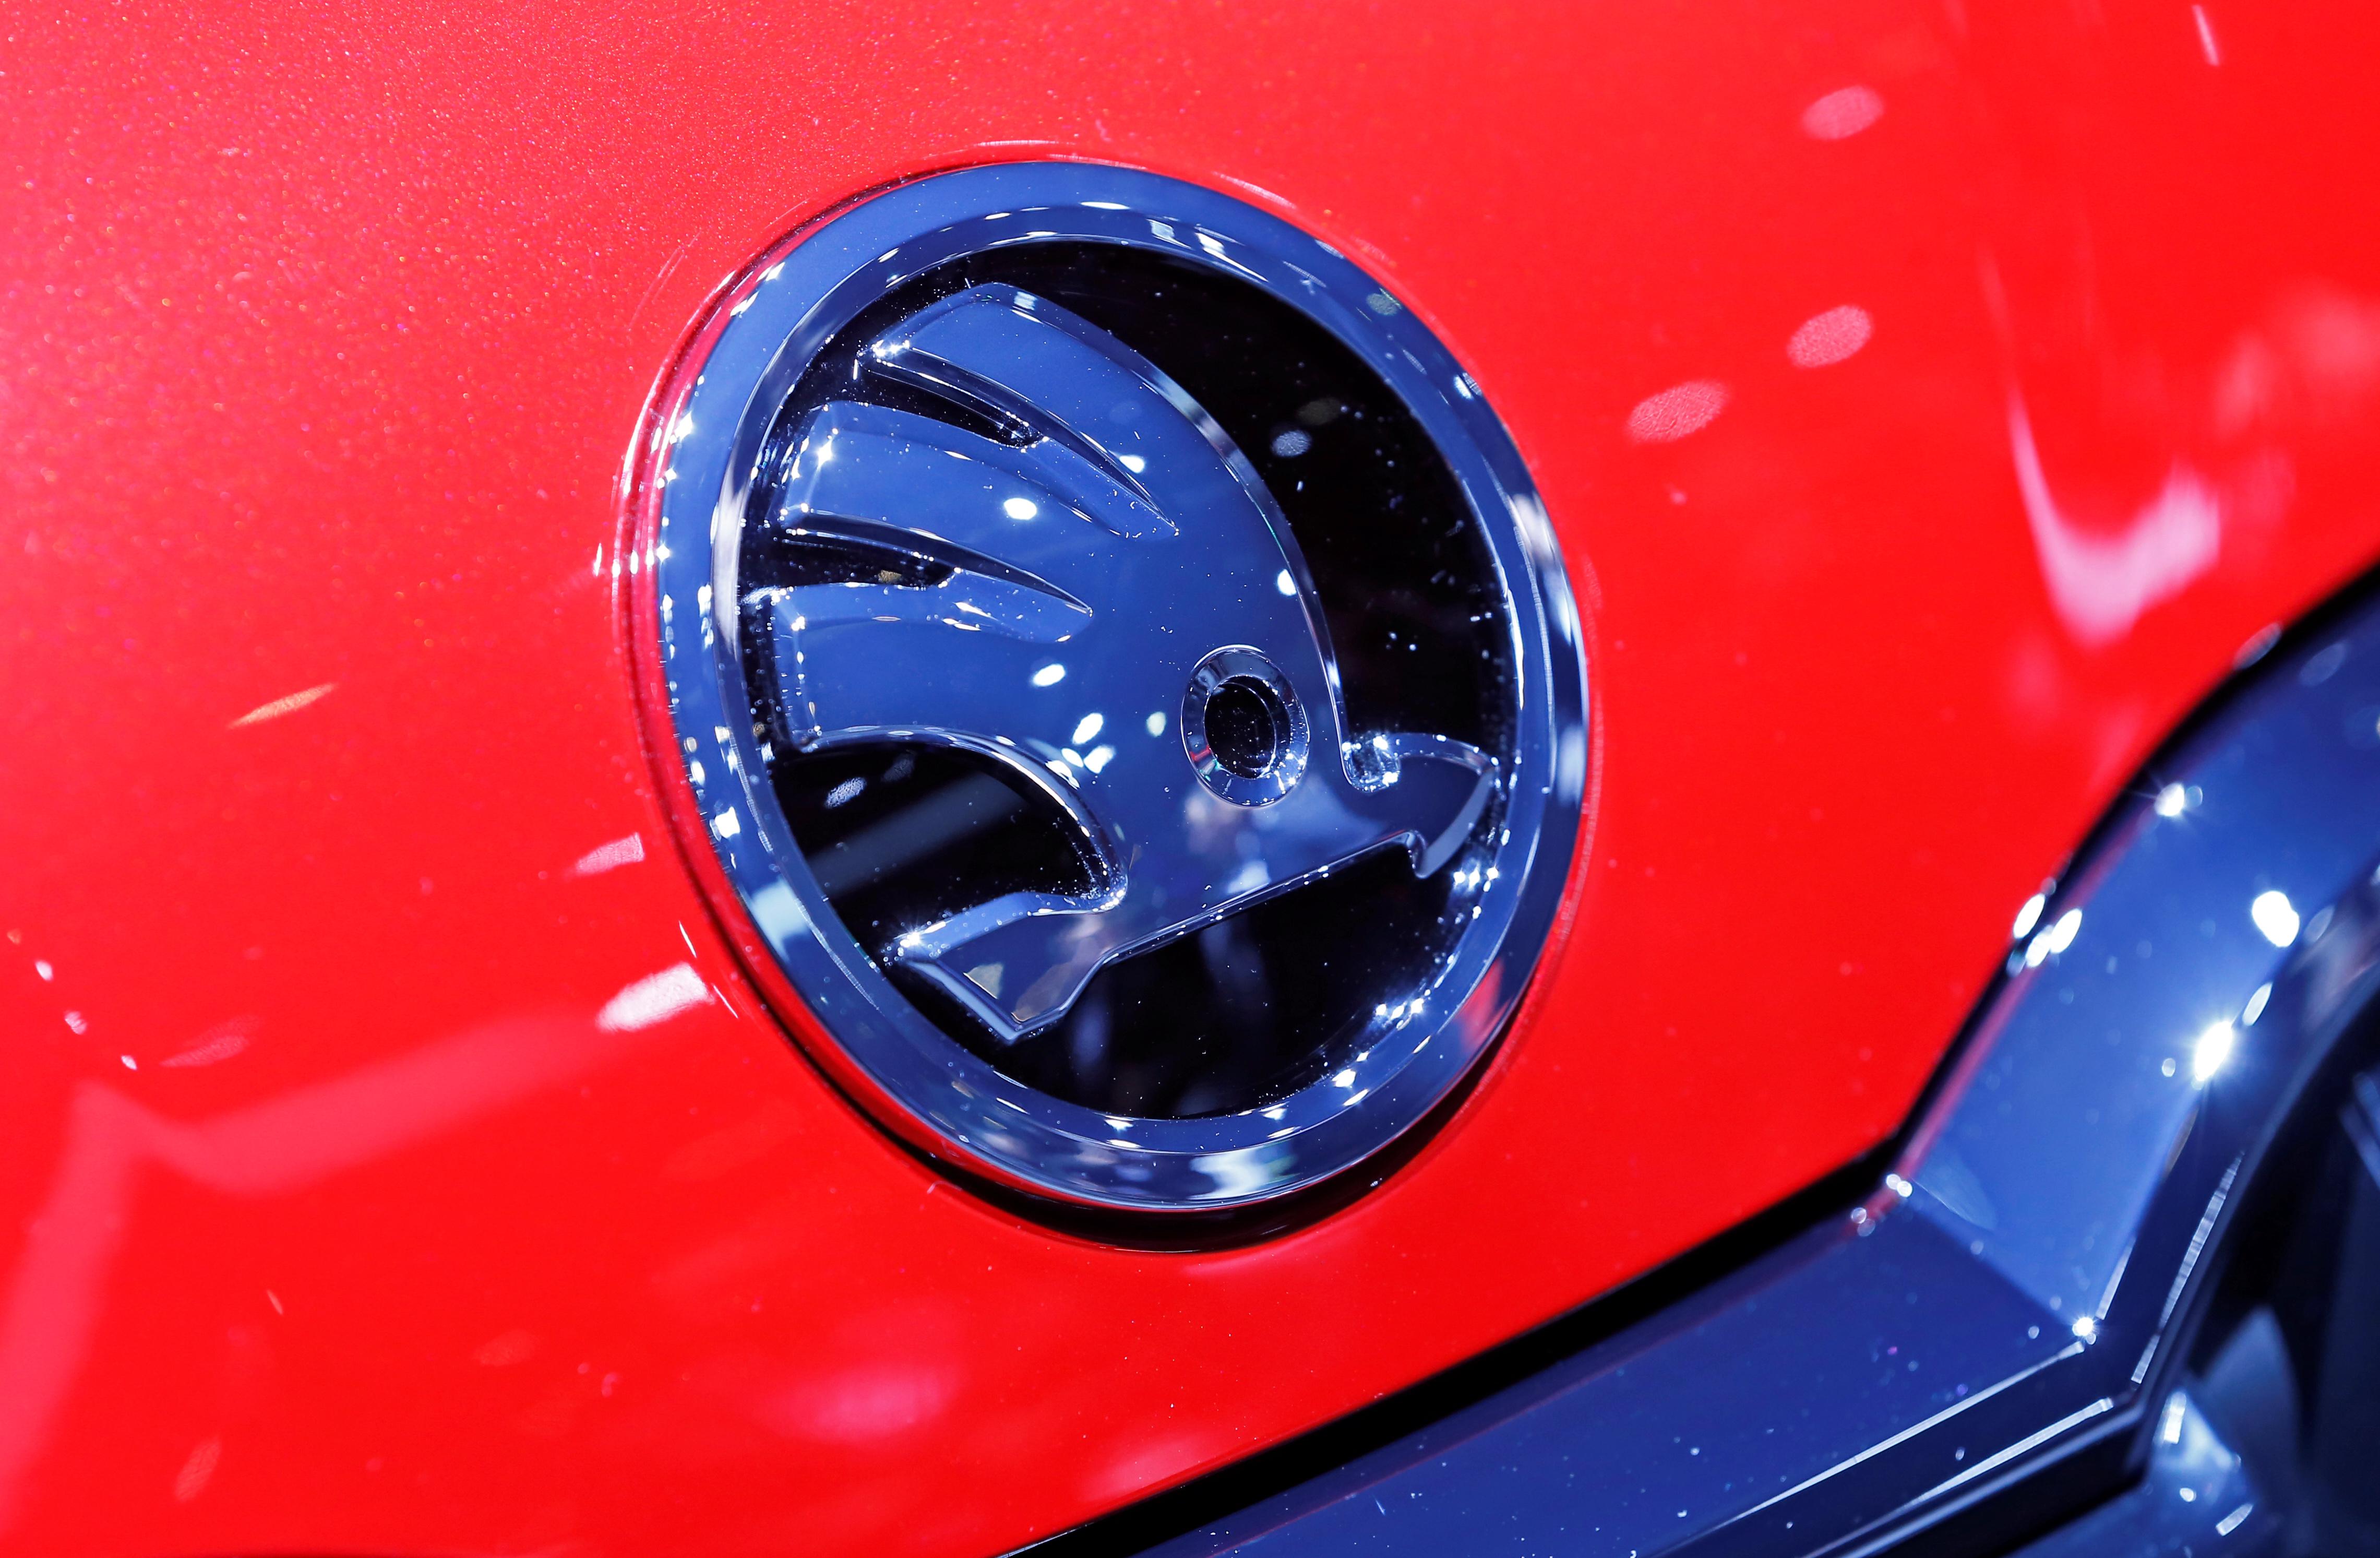 A Skoda logo is displayed at the 89th Geneva International Motor Show in Geneva, Switzerland March 5, 2019.  REUTERS/Pierre Albouy